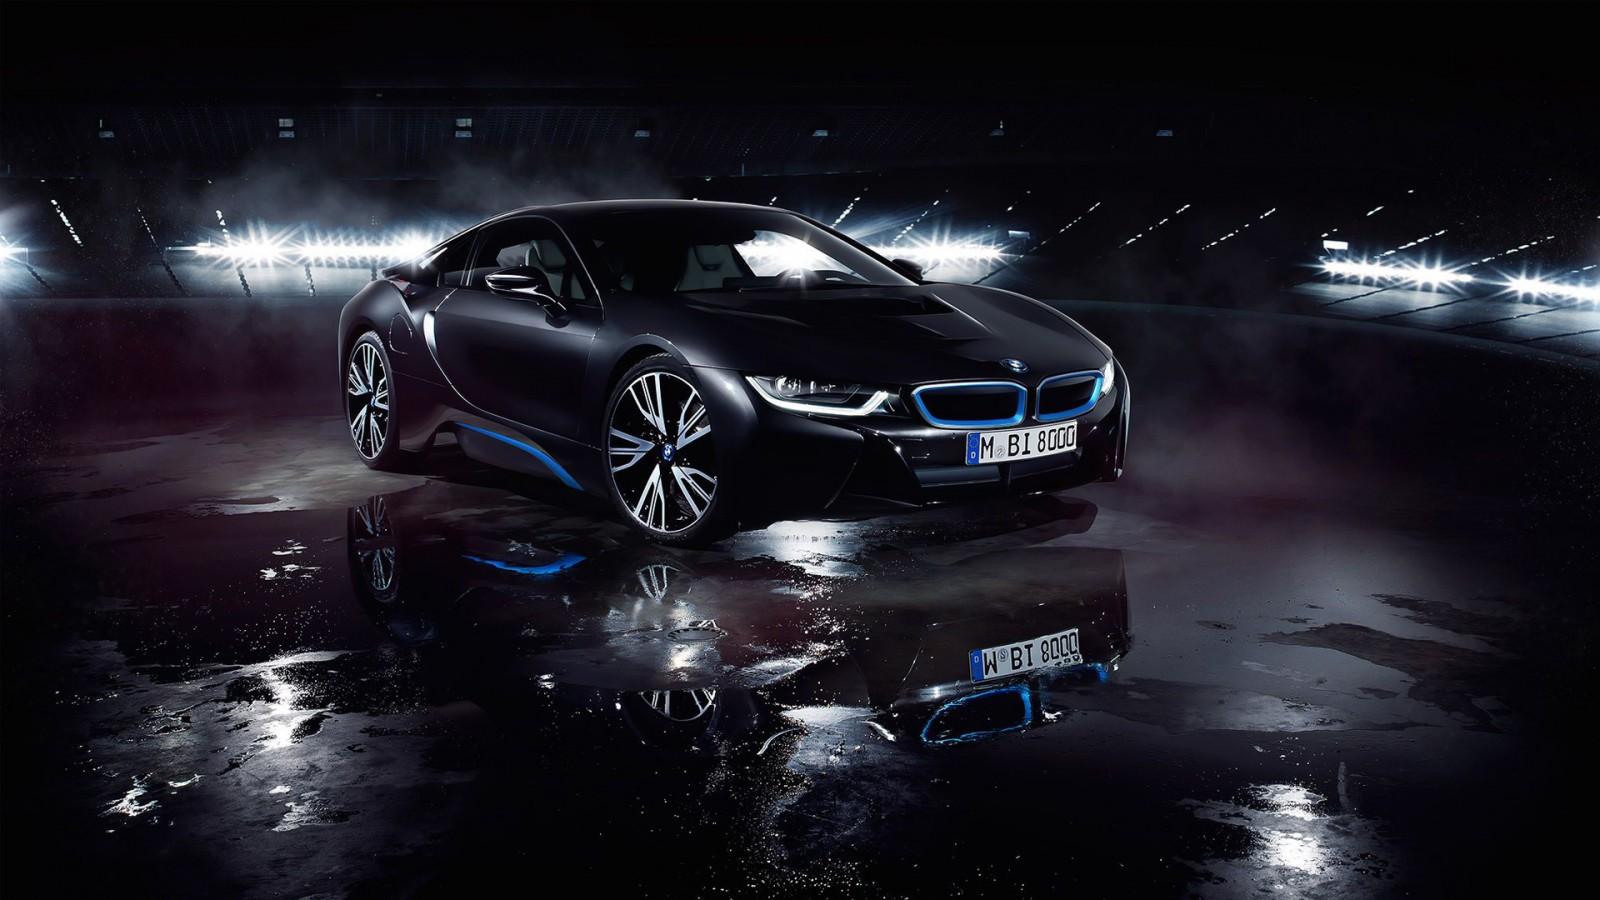 Bmw I8 Car Concept 4k Hd Desktop Wallpaper For 4k Ultra Hd: BMW I8 Matte Black Wallpaper